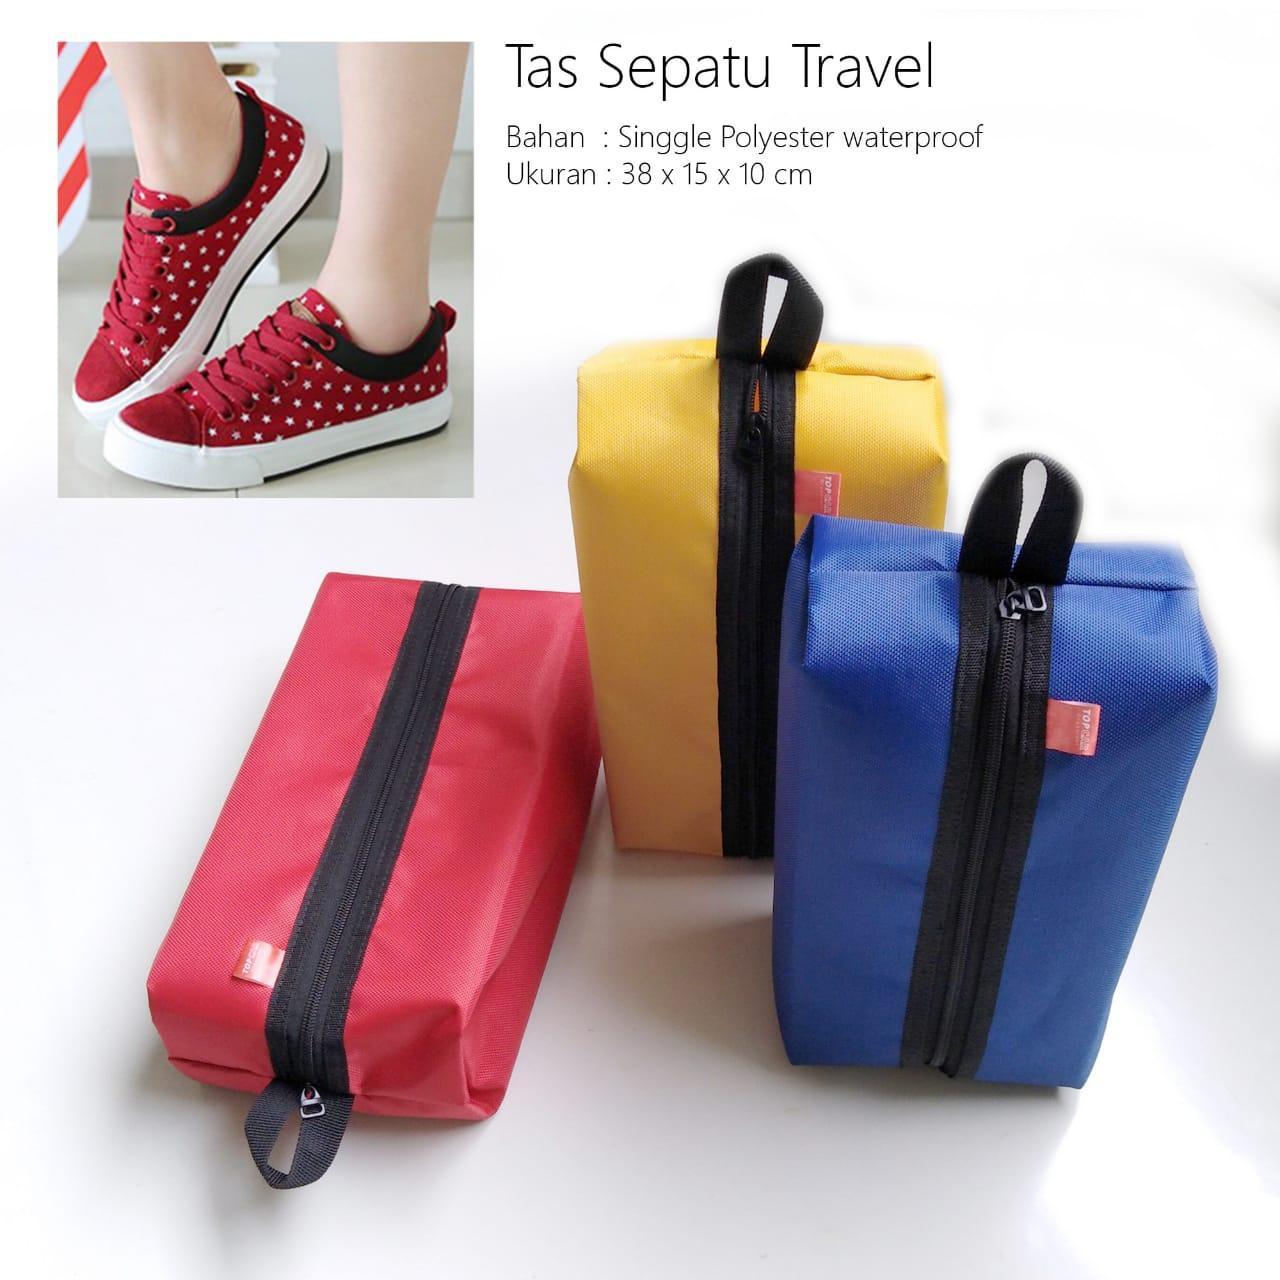 Ardilla Tas Sepatu Polos / Shoes Bag / Tas Sandal / Tas Sendal / Travel Bag